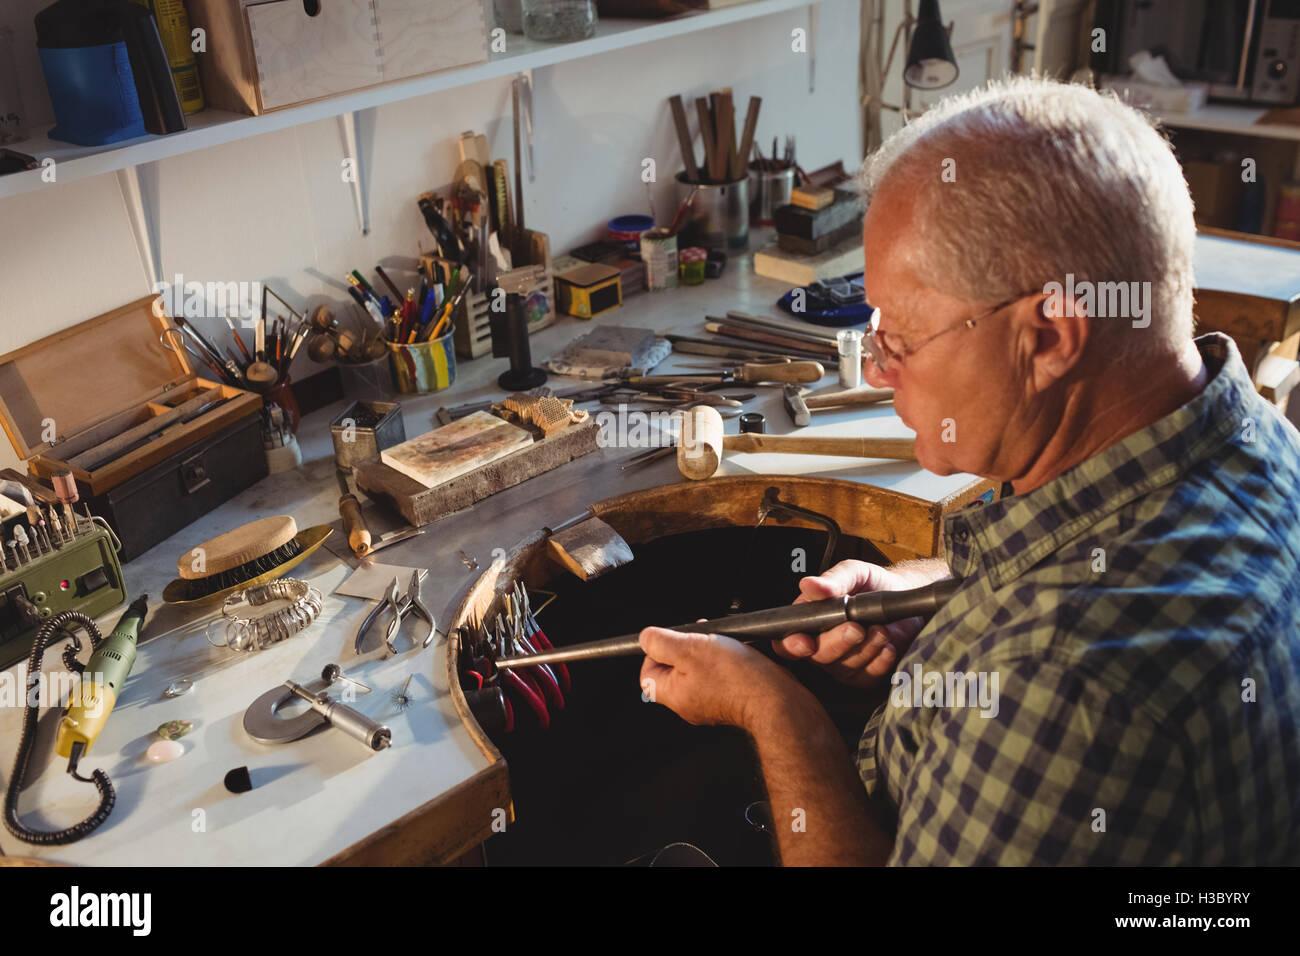 Goldsmith preparing work tool - Stock Image